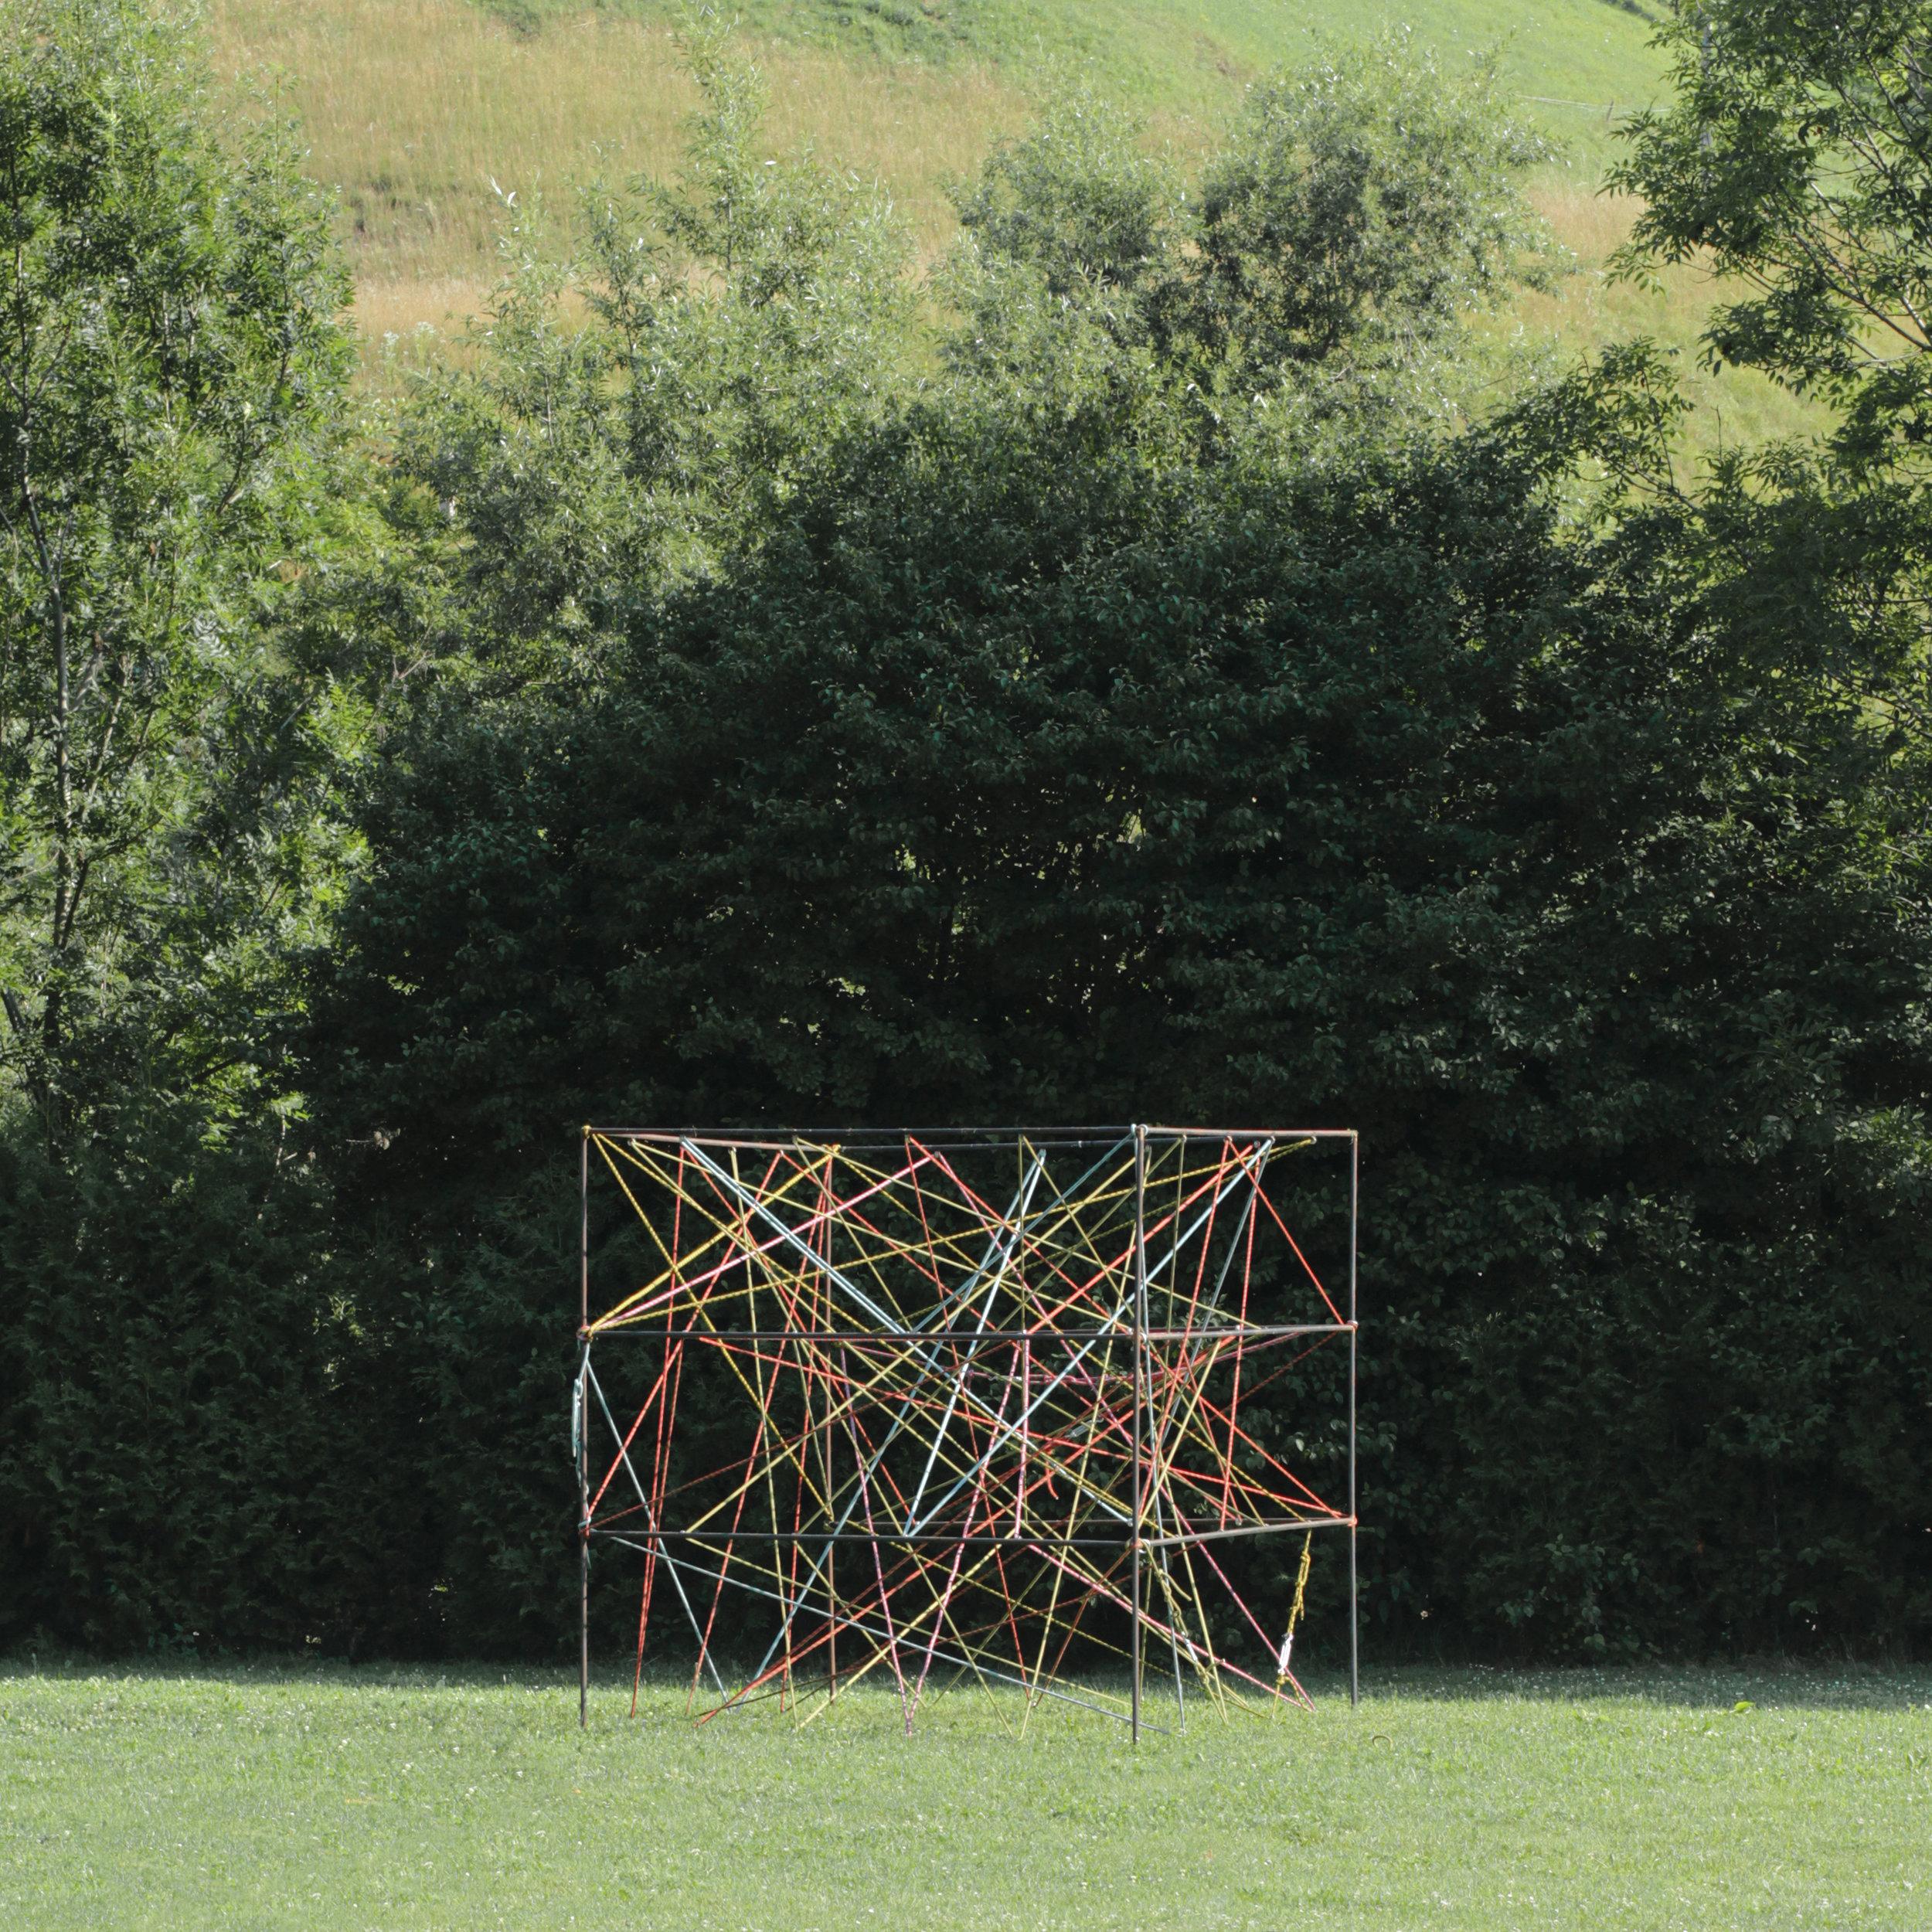 PLAYGROUND KSEVT cube foto Ajda Schmidt 4.jpg